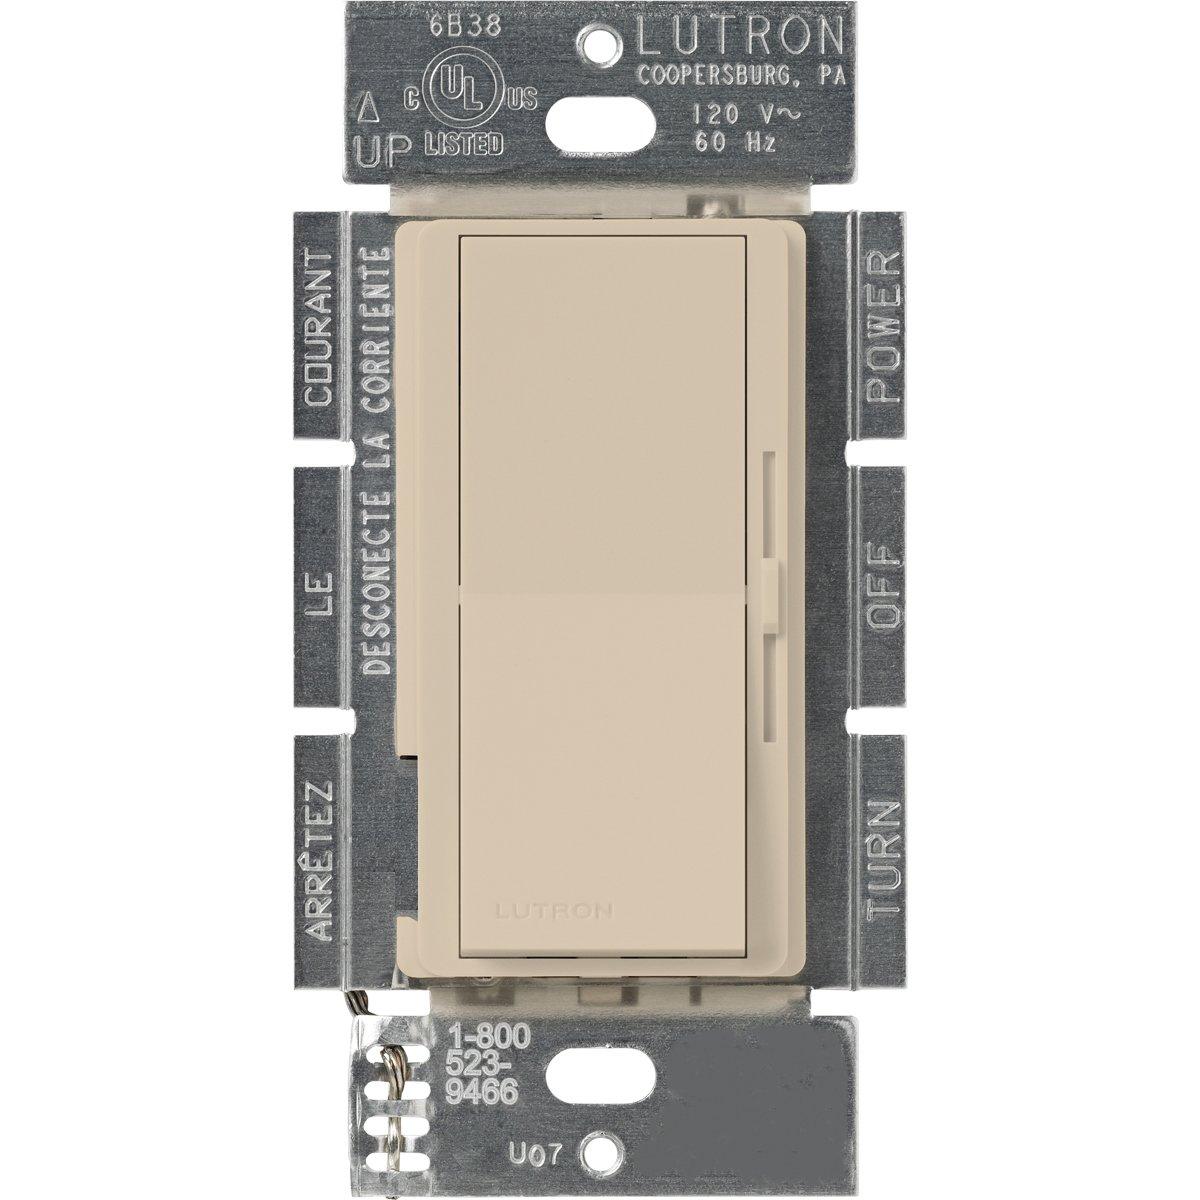 Lutron DVSCLV-10P-TP Diva 800-watt Single Pole Magnetic Low-Voltage Dimmer, Taupe